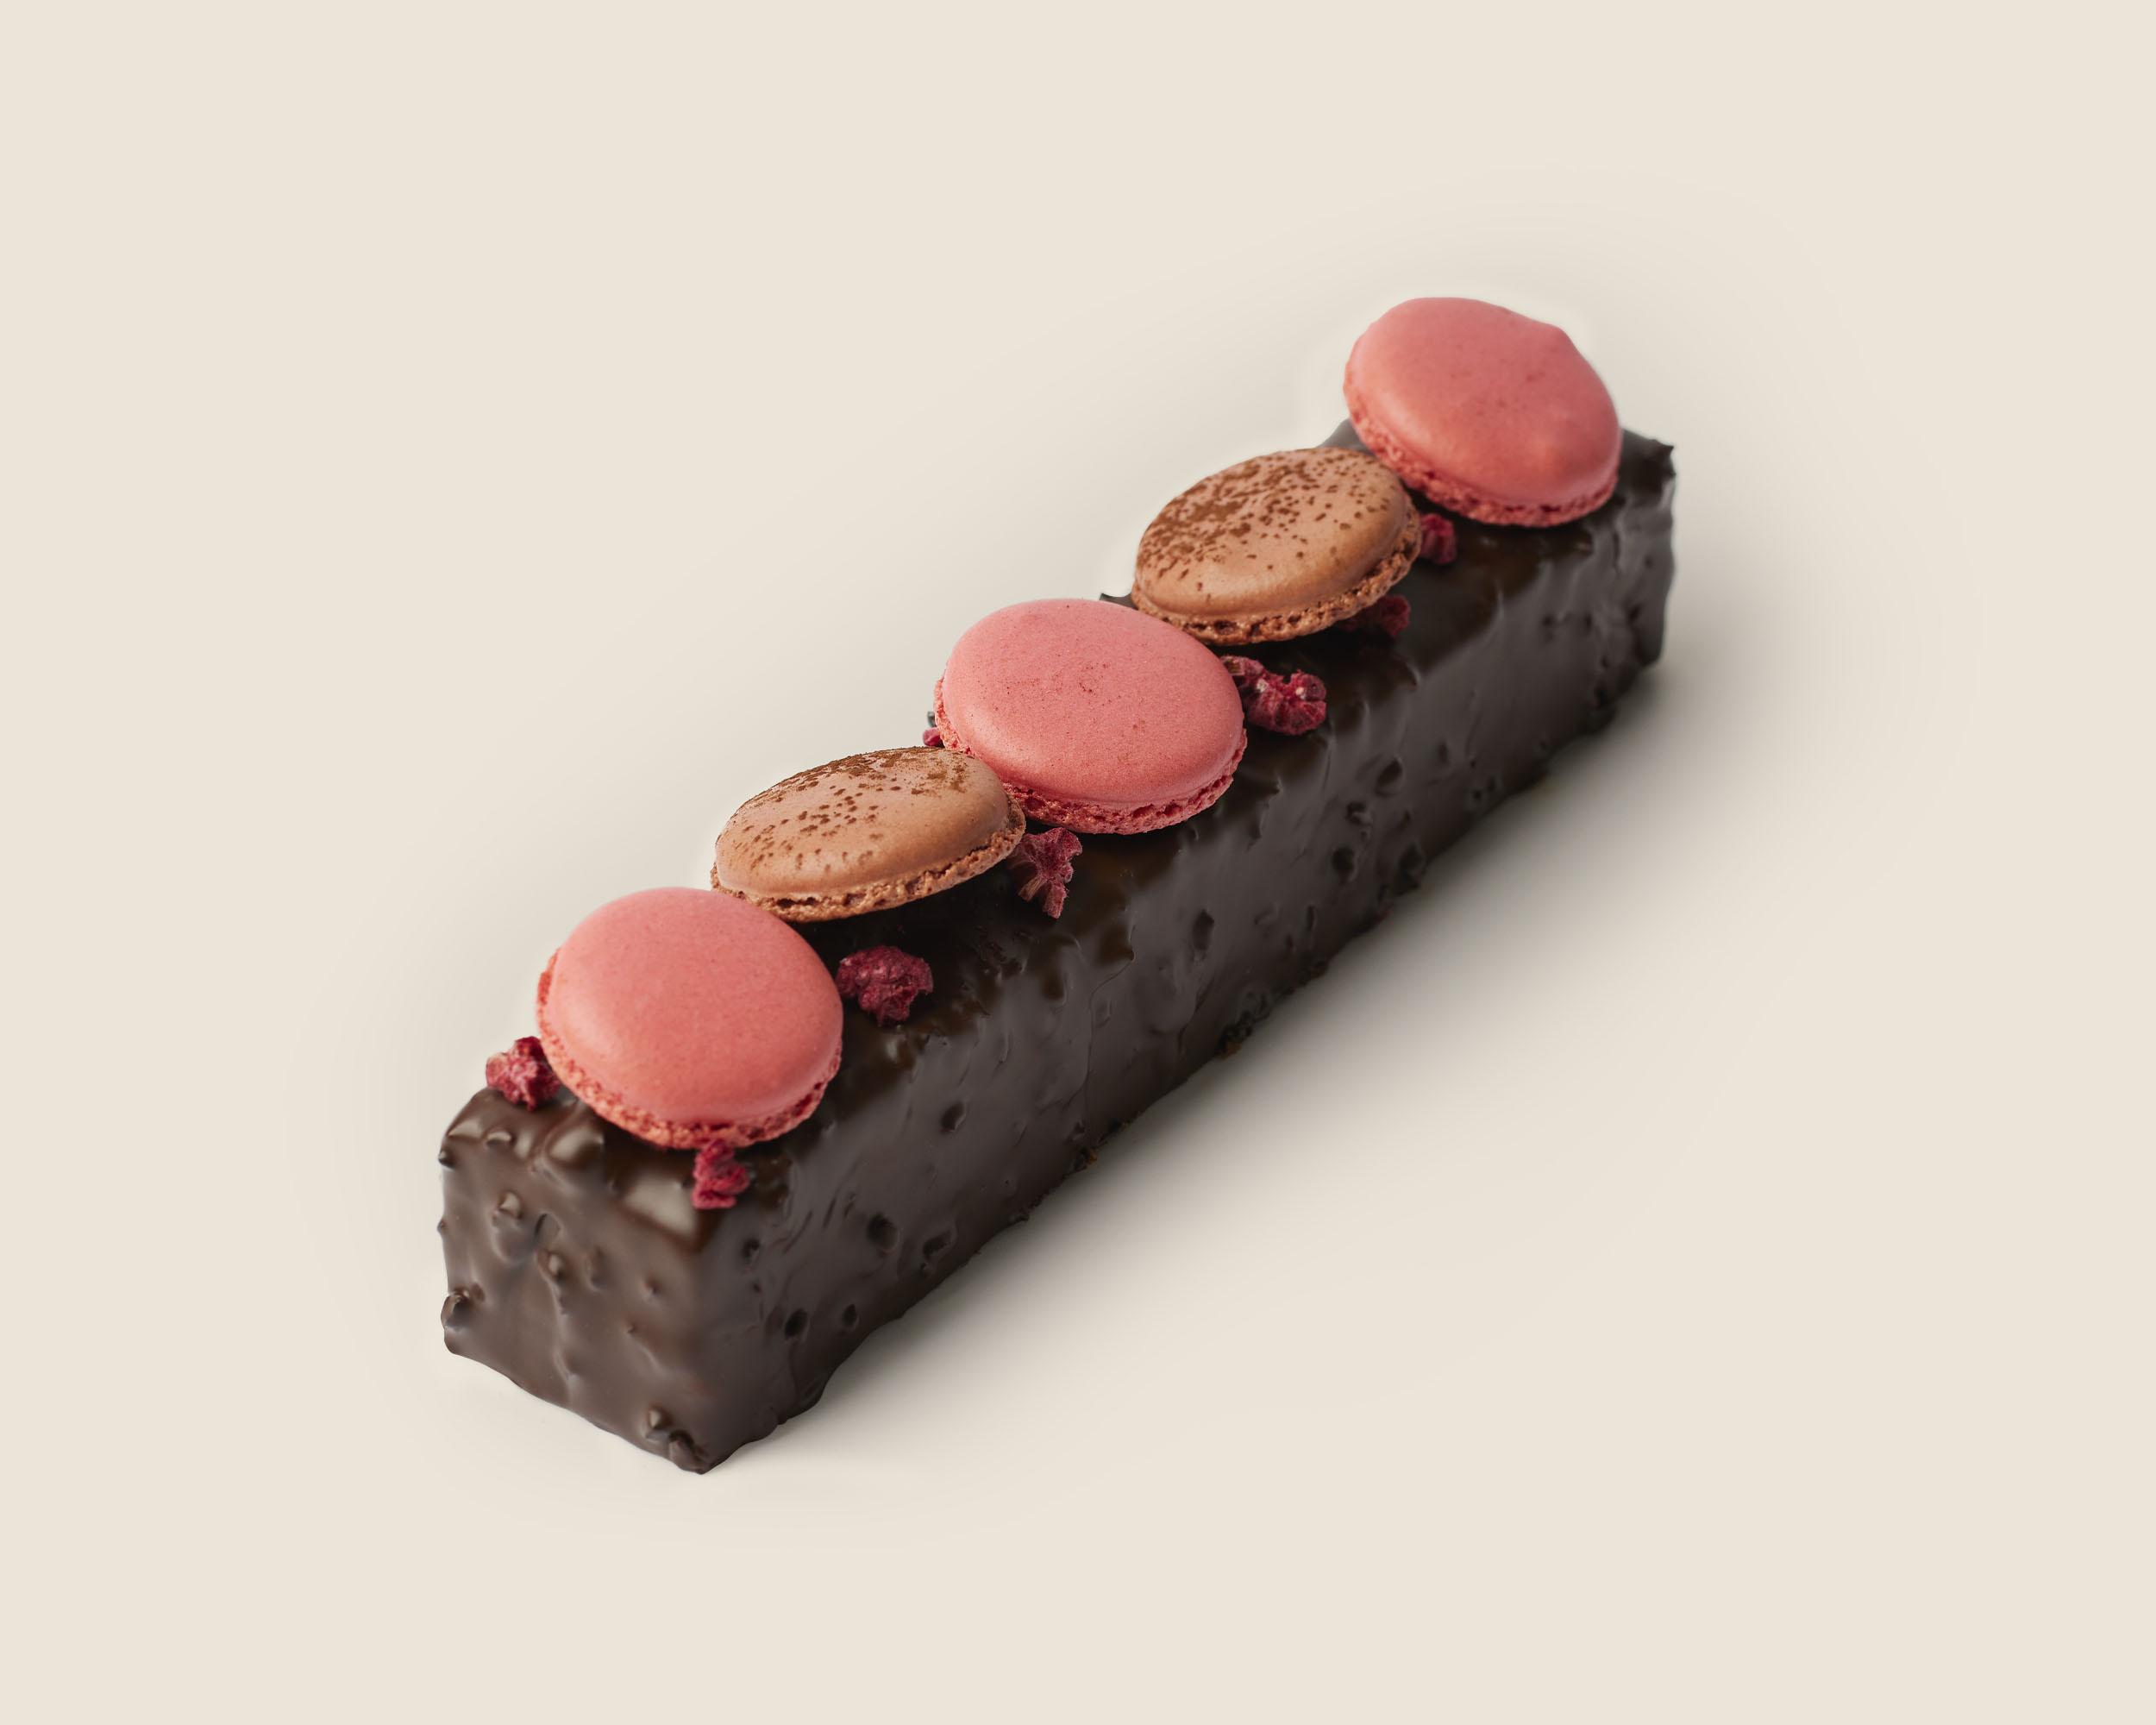 Cake thé fruitrouge